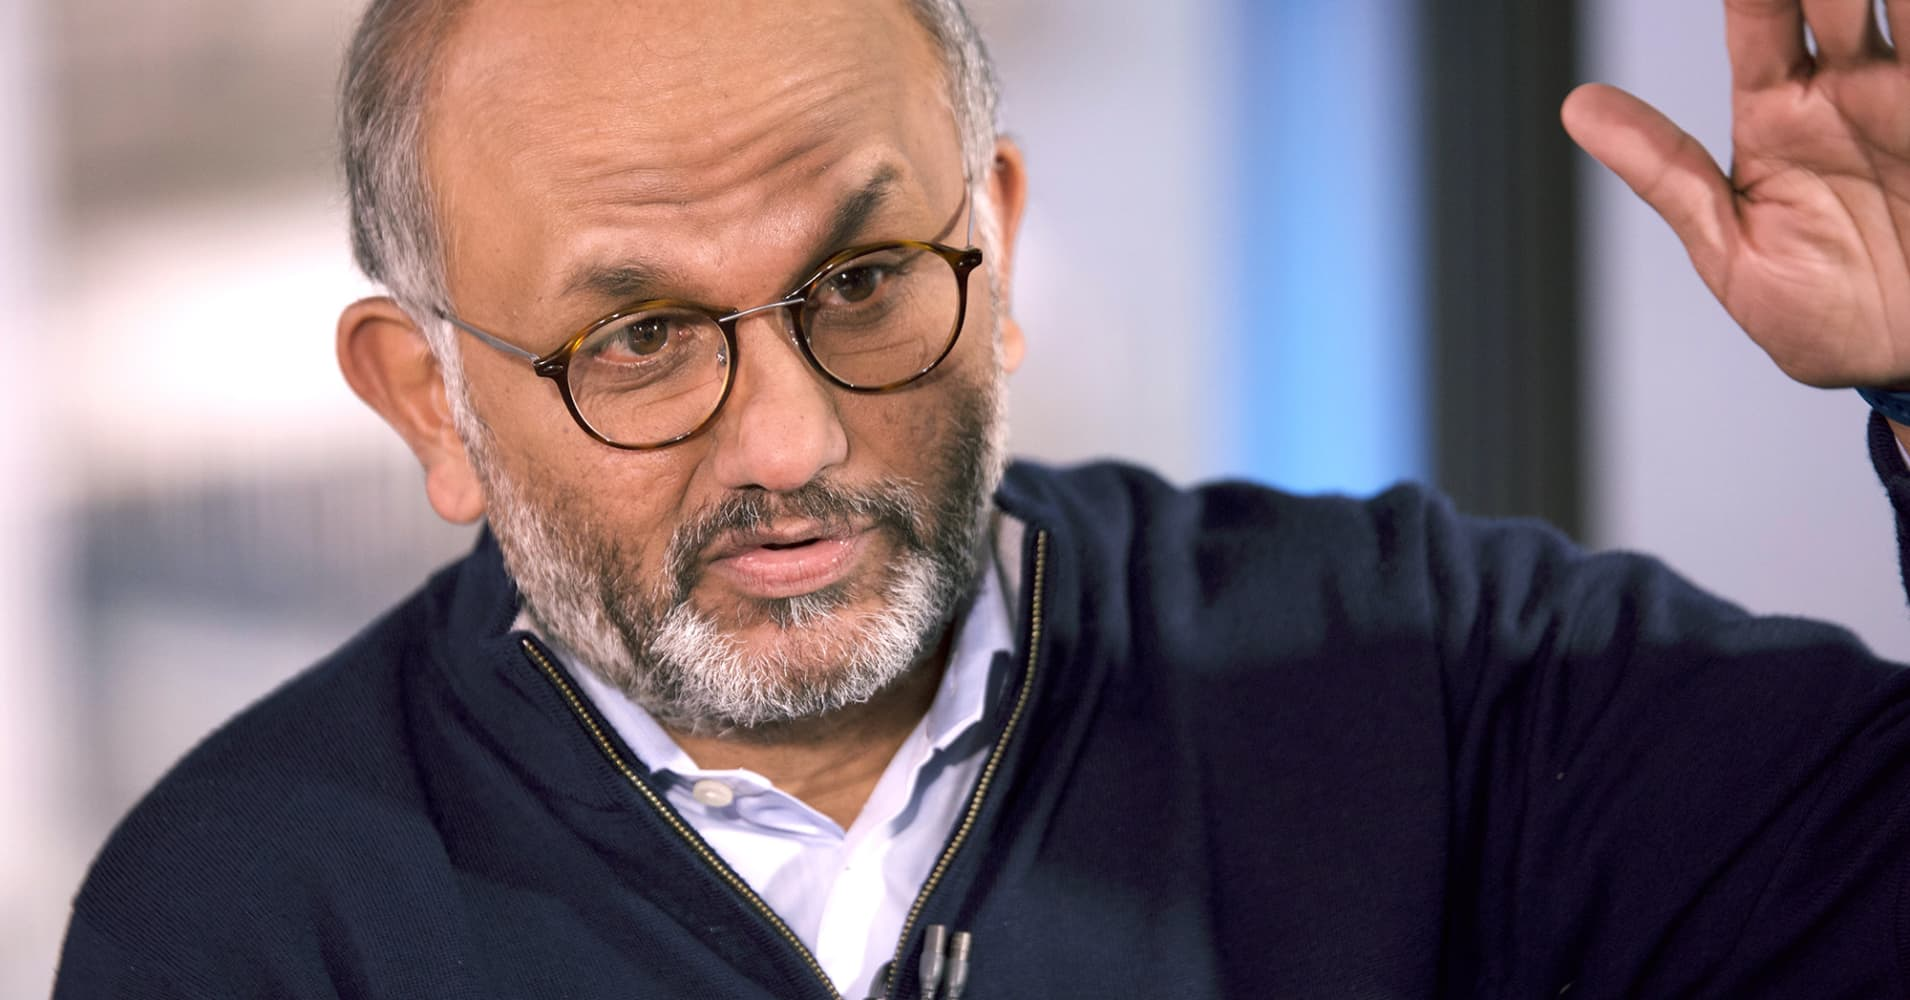 Adobe CEO: Microsoft partnership will automate sales, marketing with AI